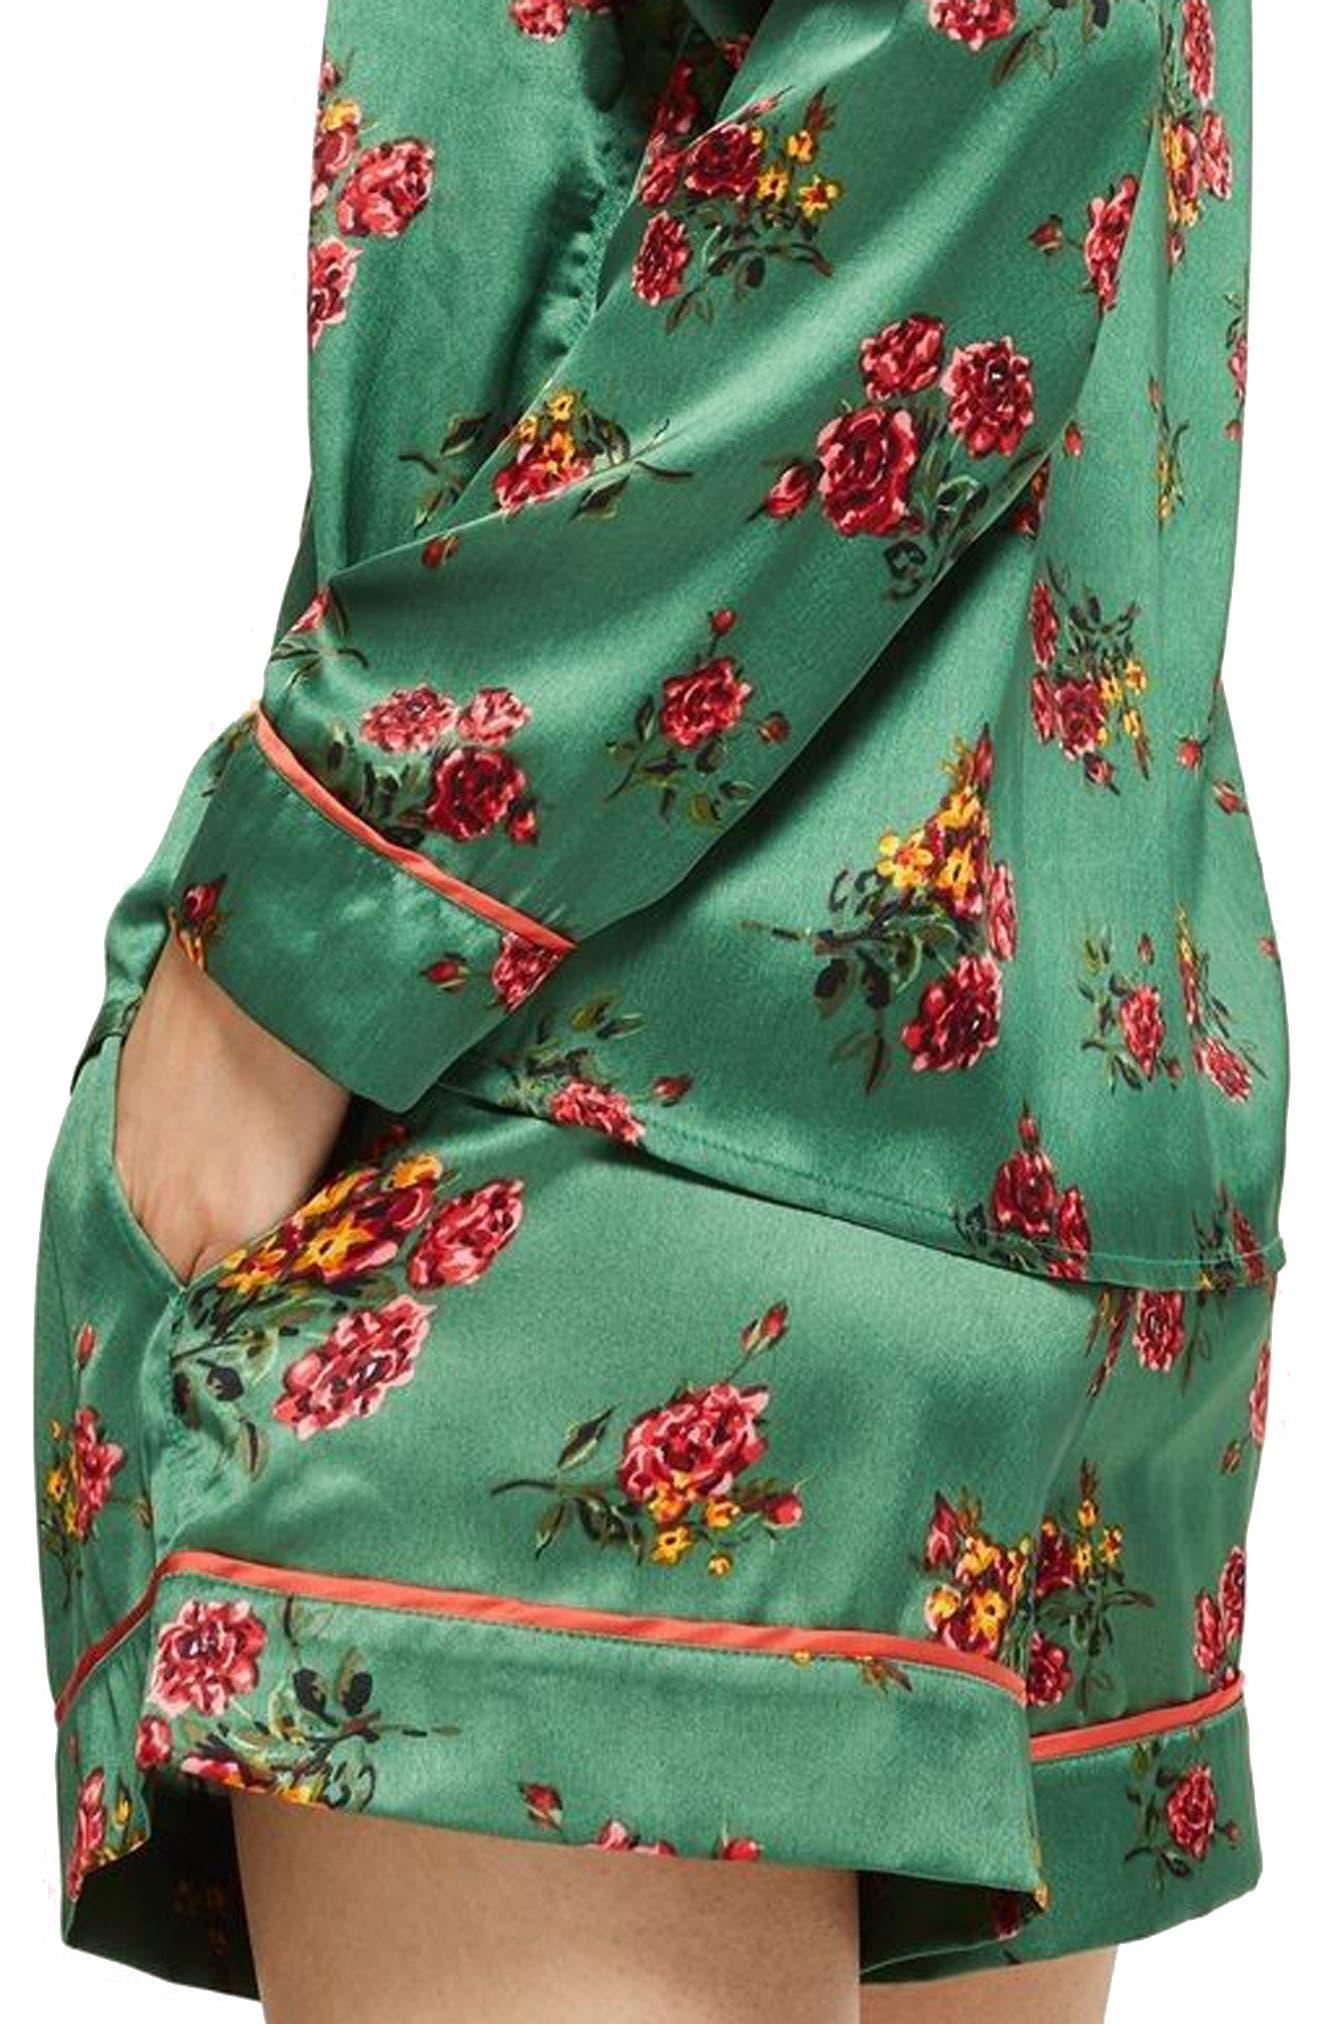 Floral Print Pajama Shorts,                             Alternate thumbnail 2, color,                             Bright Green Multi